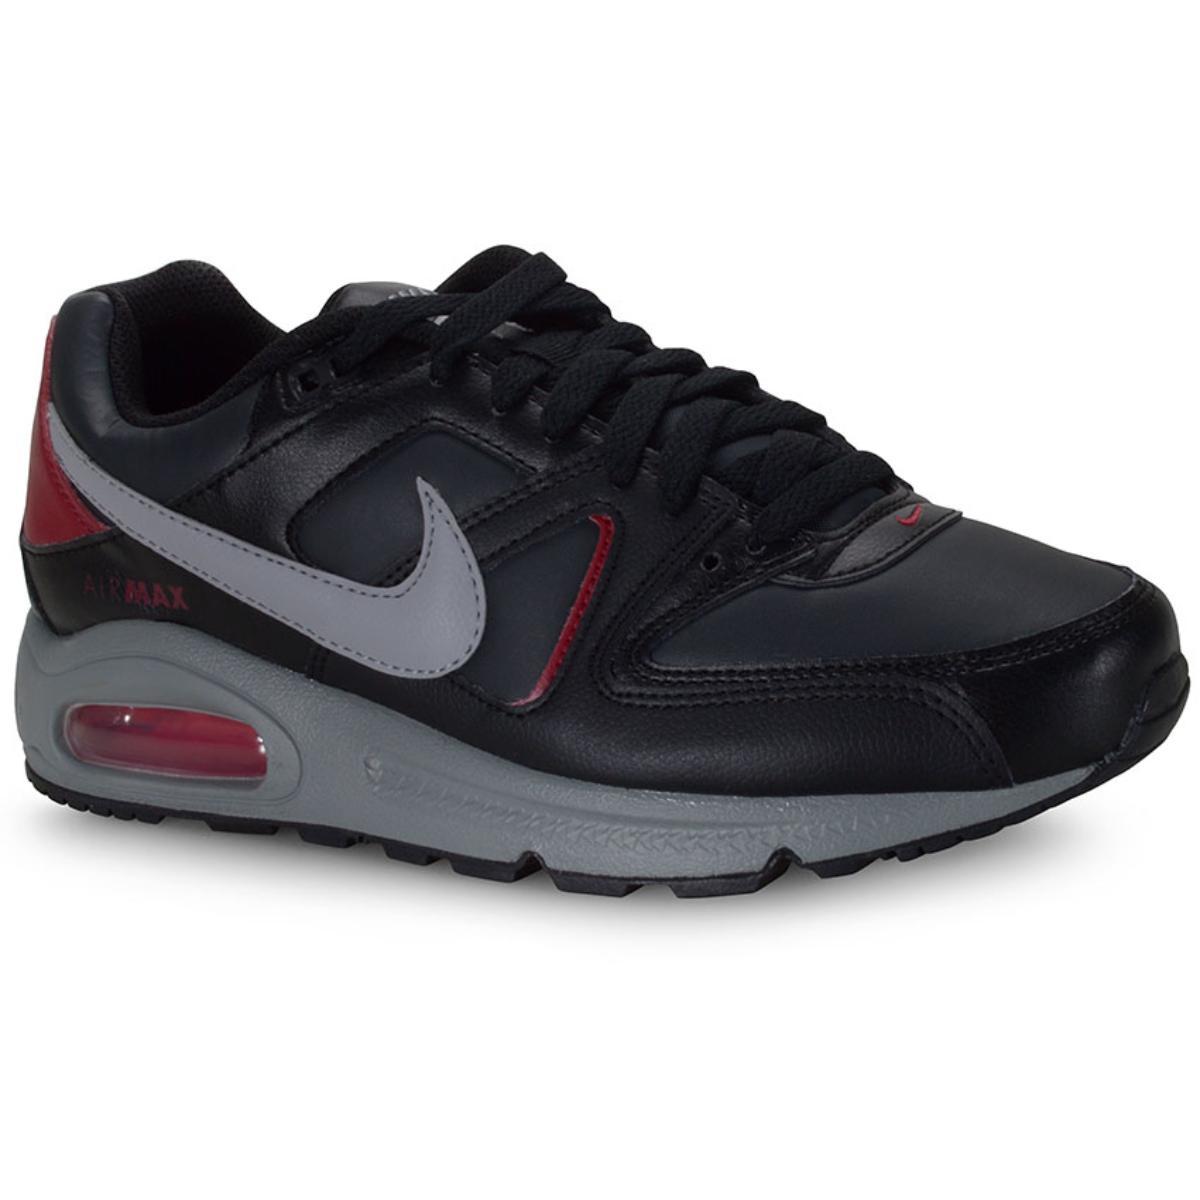 Tênis Masculino Nike Cd0873-001 Air Max Command Preto/vinho